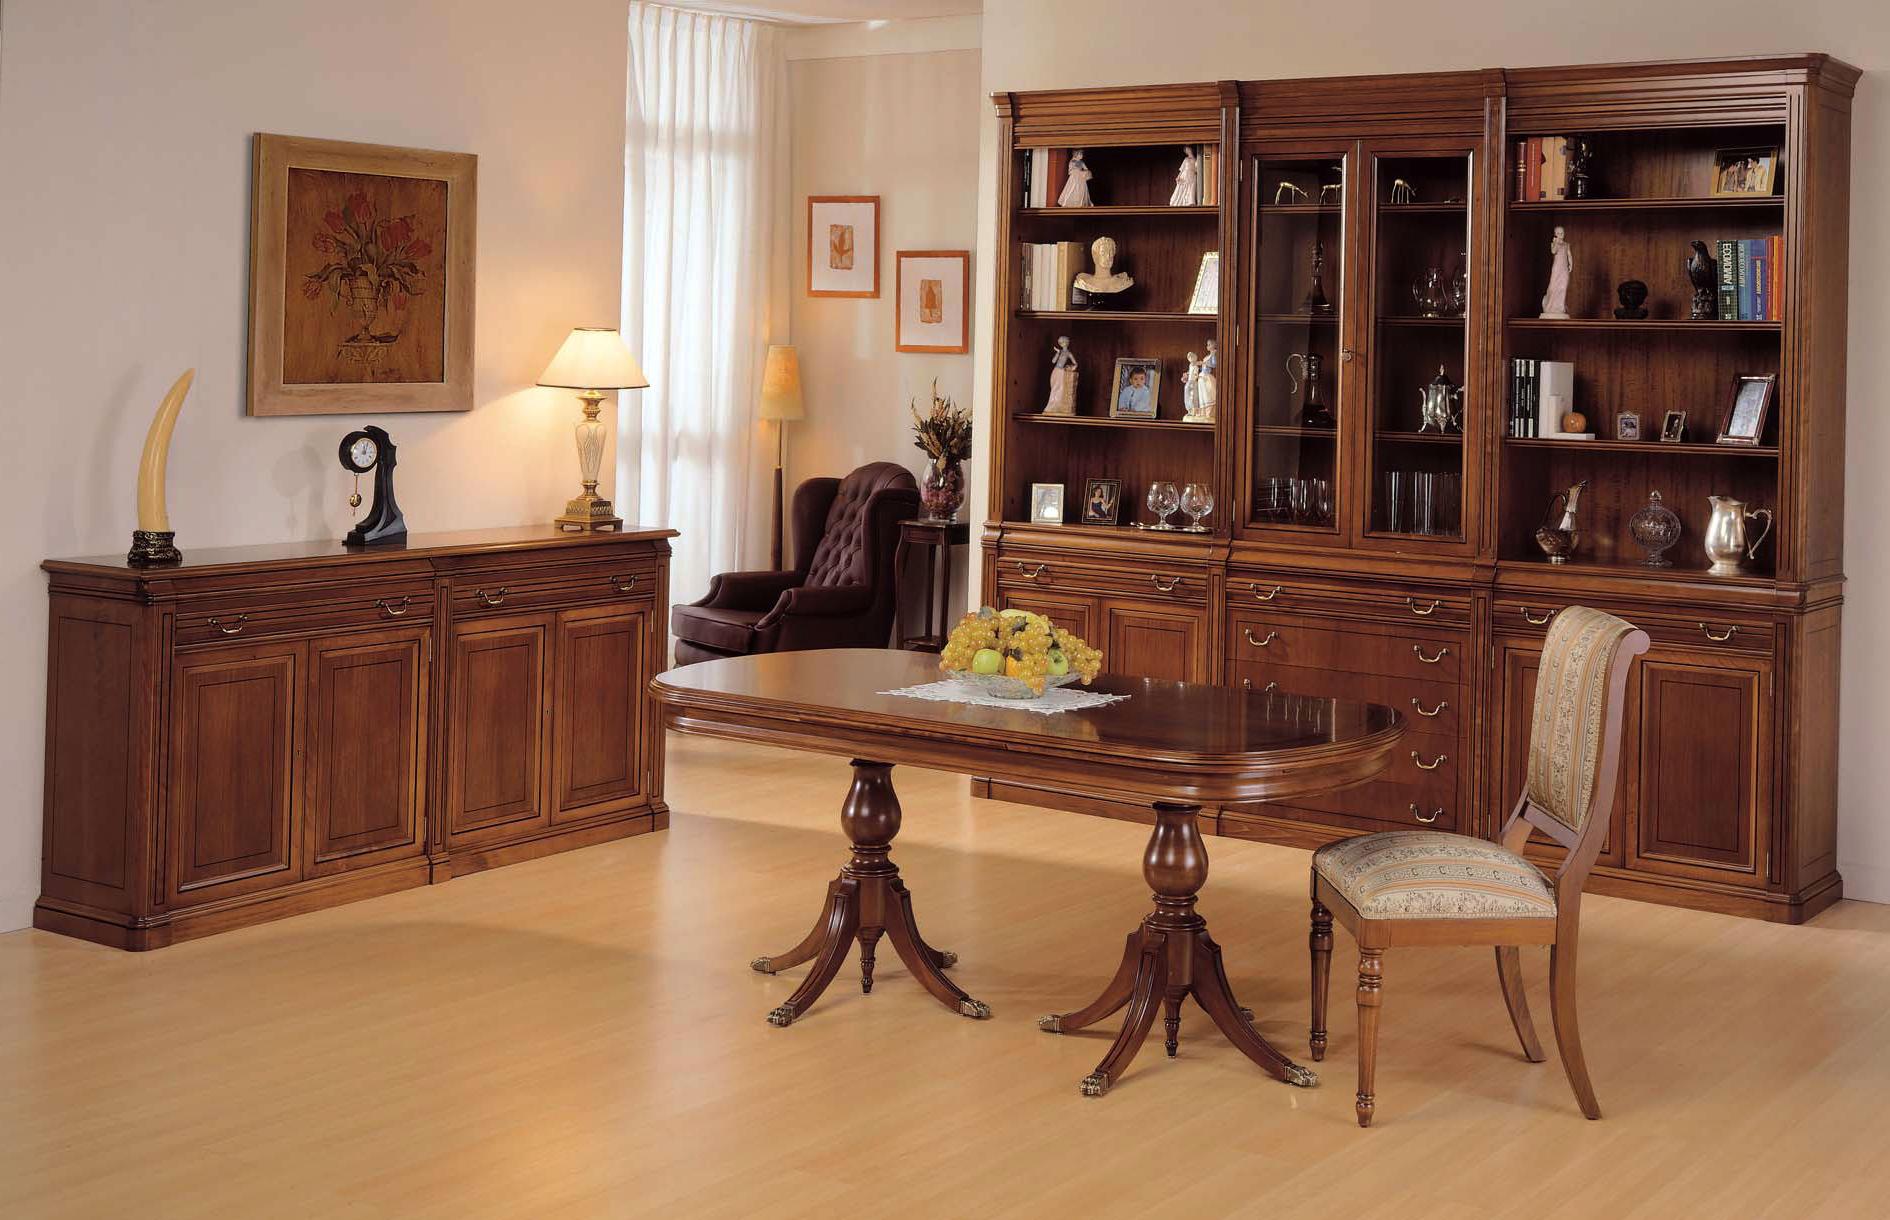 Muebles De Salon Clasicos Baratos 3ldq Salones Baratos Sharon Leal